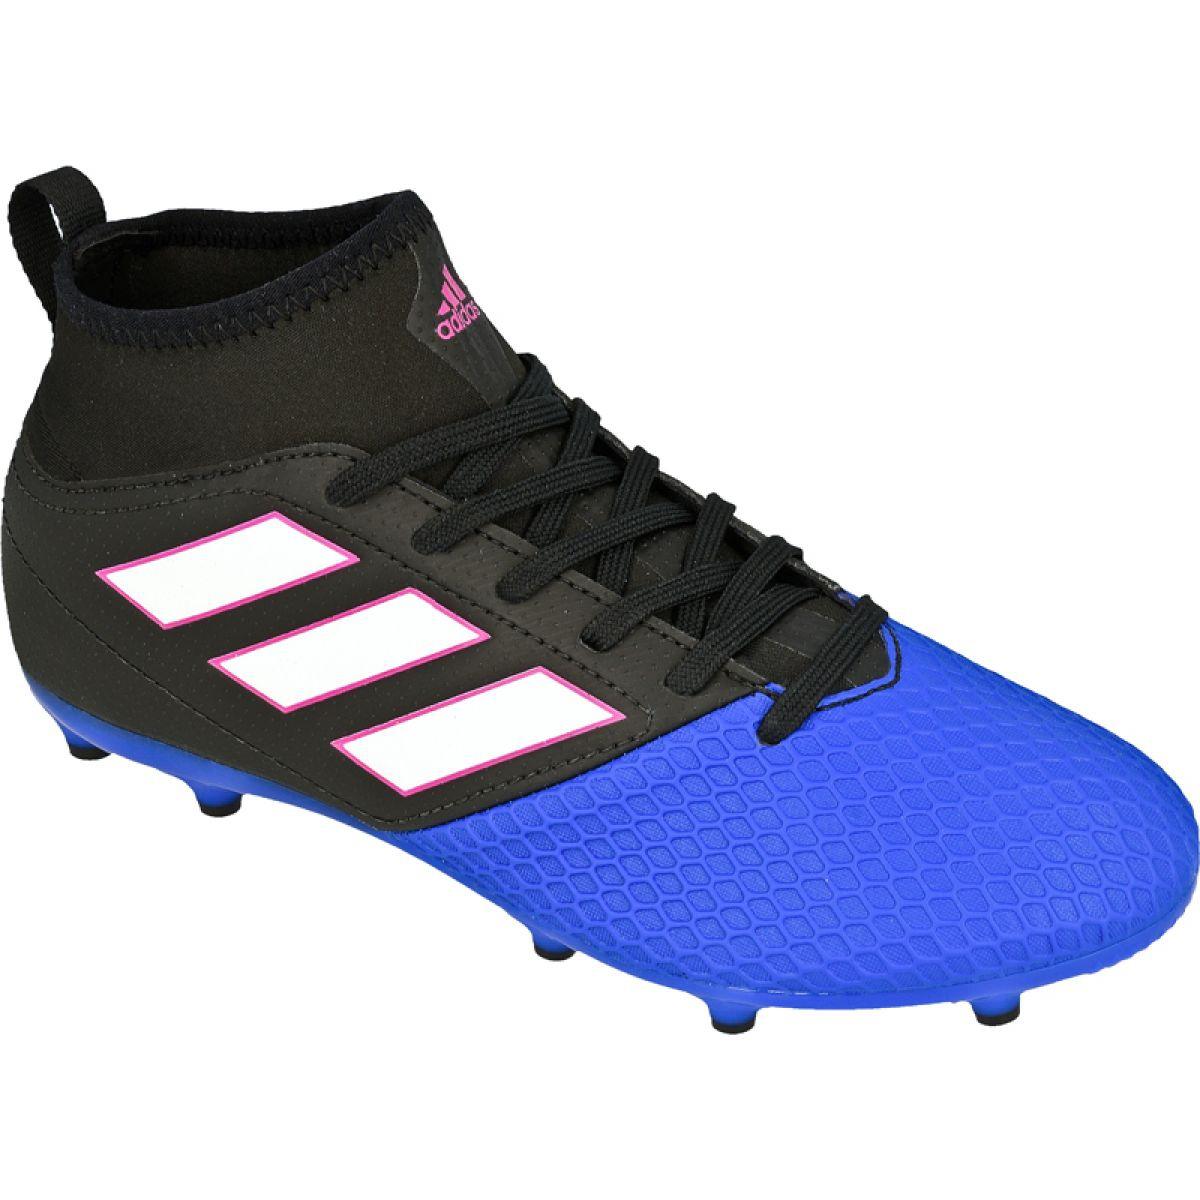 separation shoes 40e79 82eb2 Adidas Ace 17.3 Fg Jr BA9234 football shoes